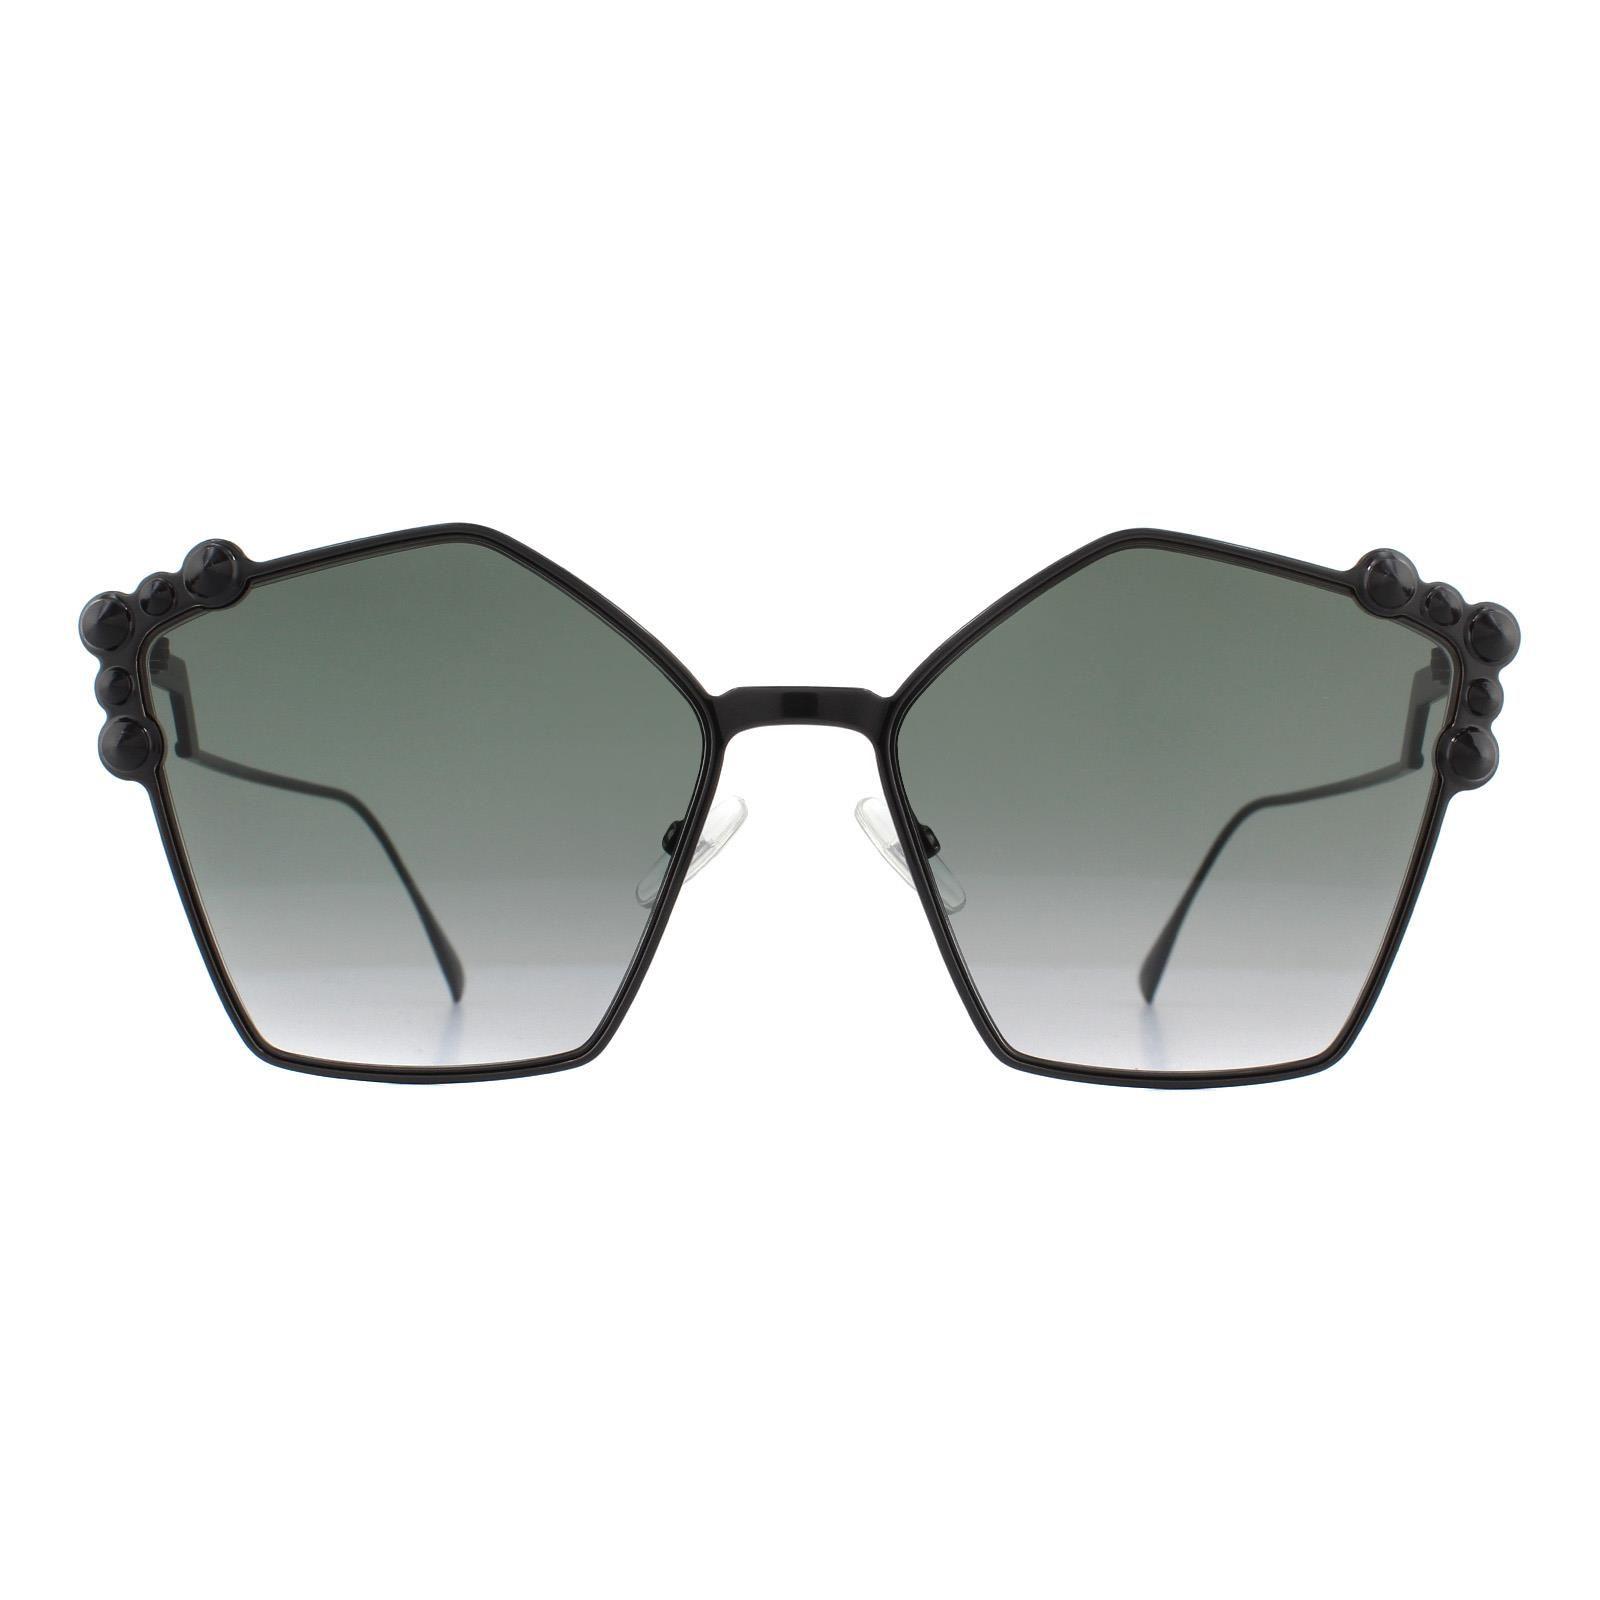 Fendi Sunglasses FF 0261/S 2O5 9O Black Dark Grey Gradient